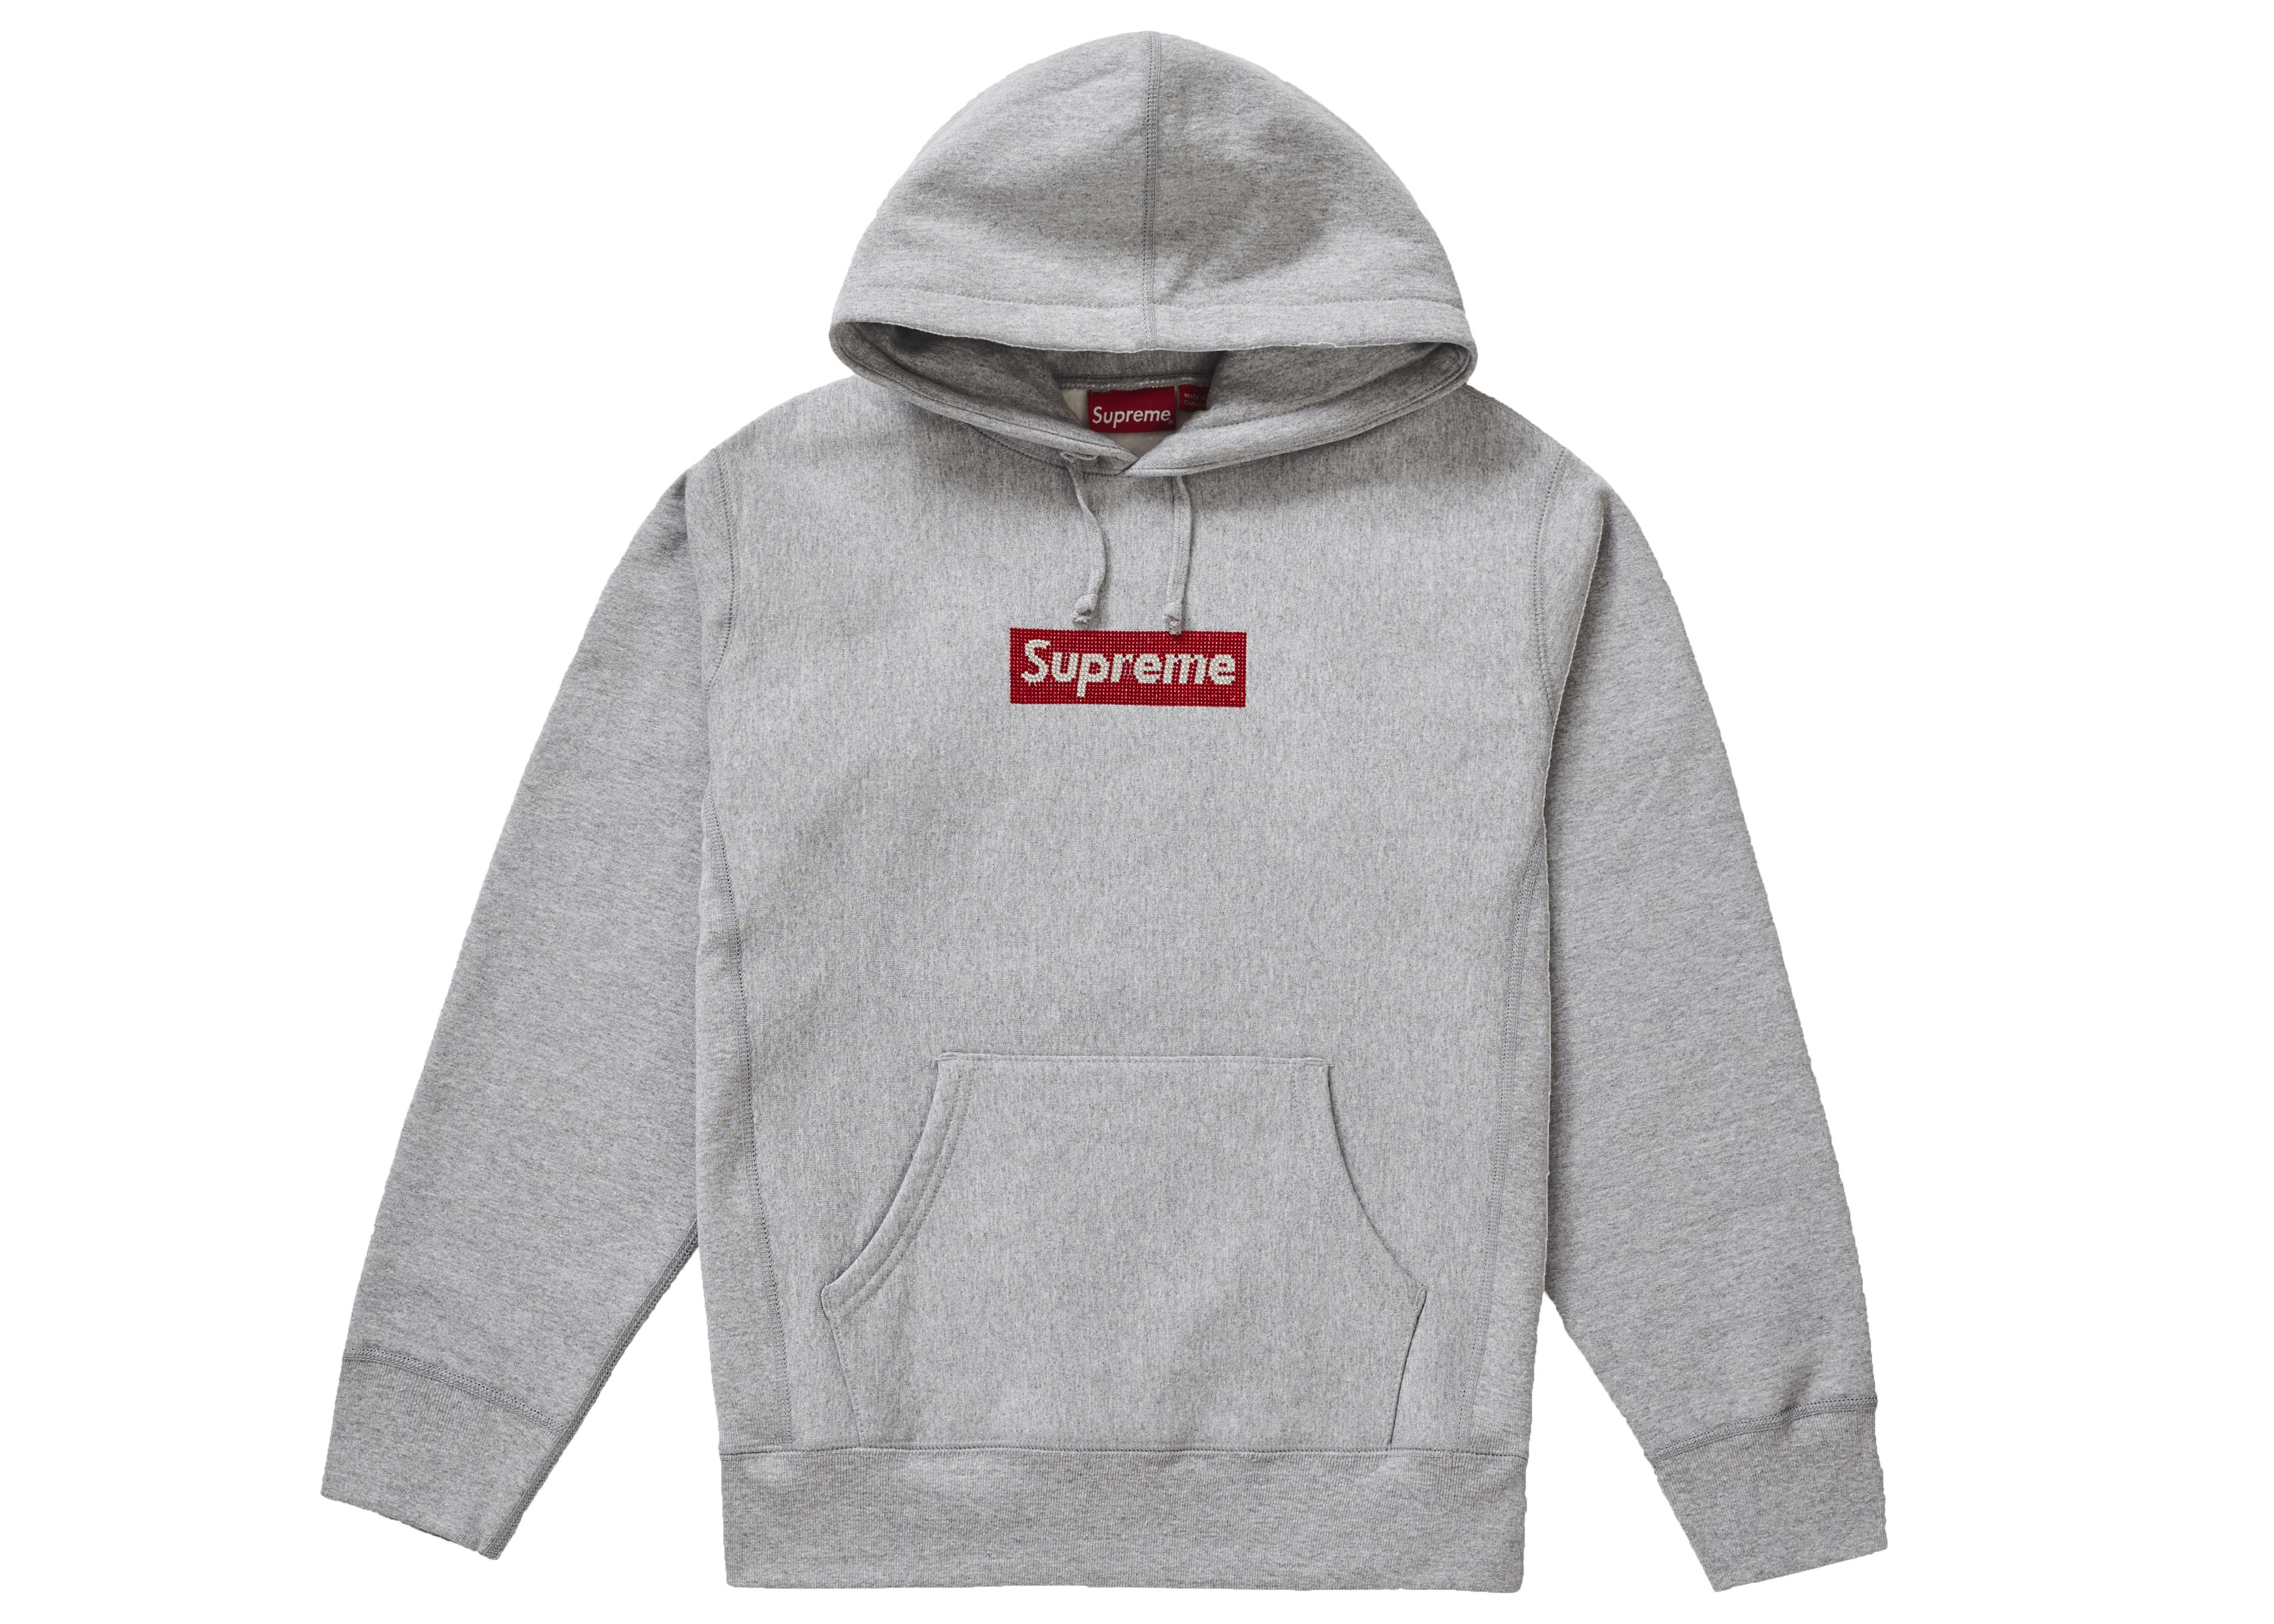 e48c56c8ebf7 Supreme Swarovski Box Logo Hooded Sweatshirt Heather Grey in Gray ...